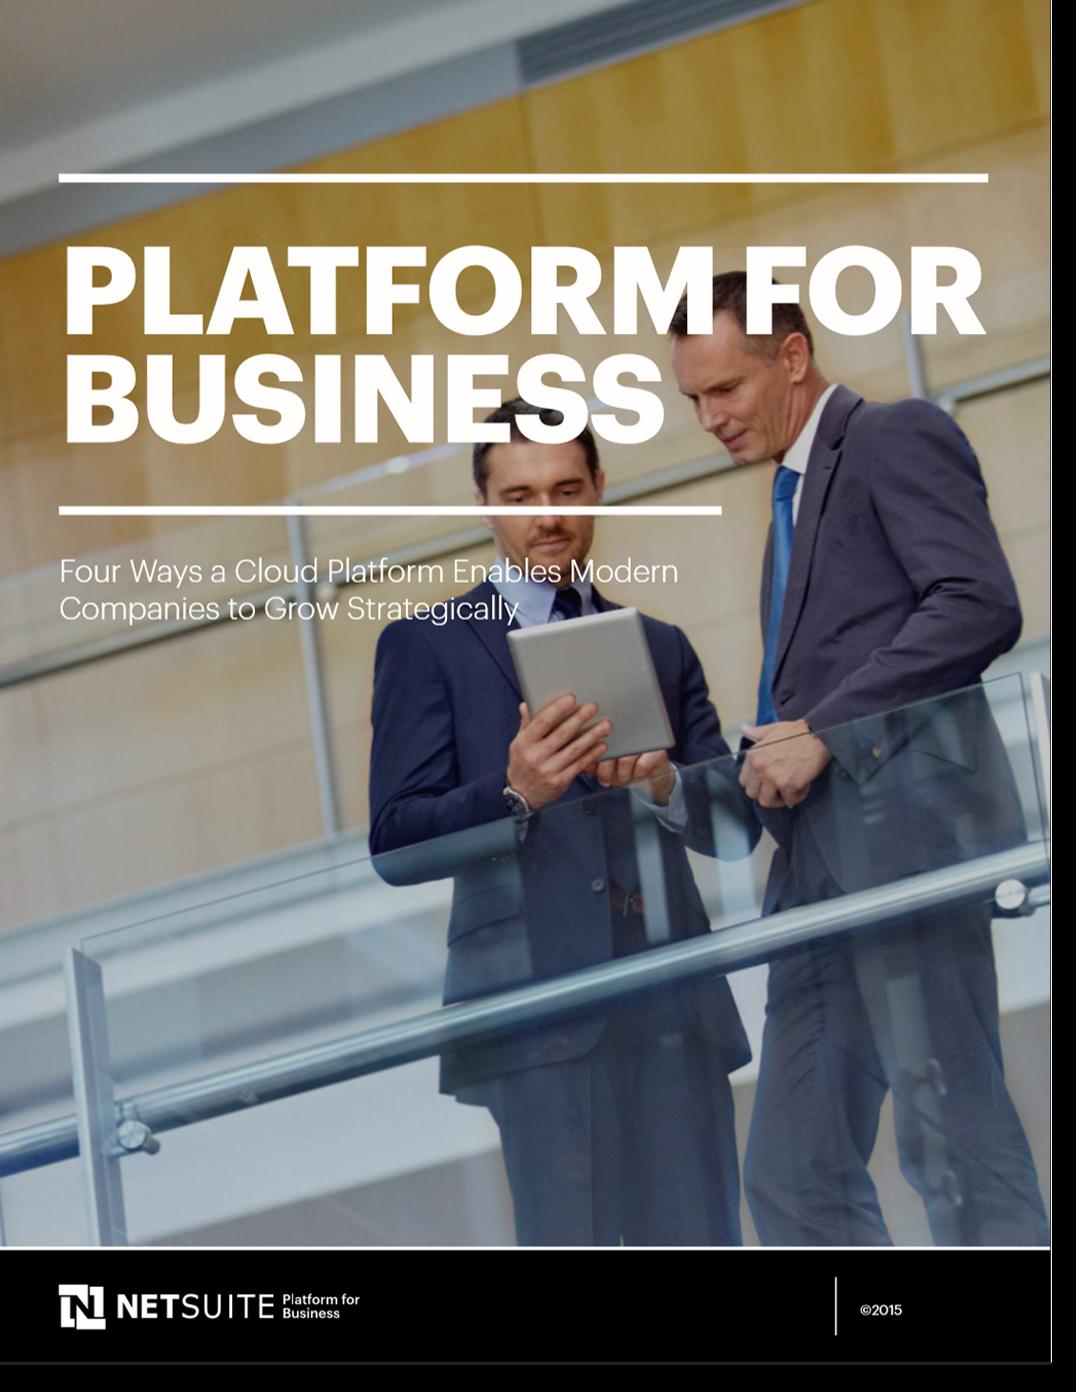 NetSuite PLatform for Business